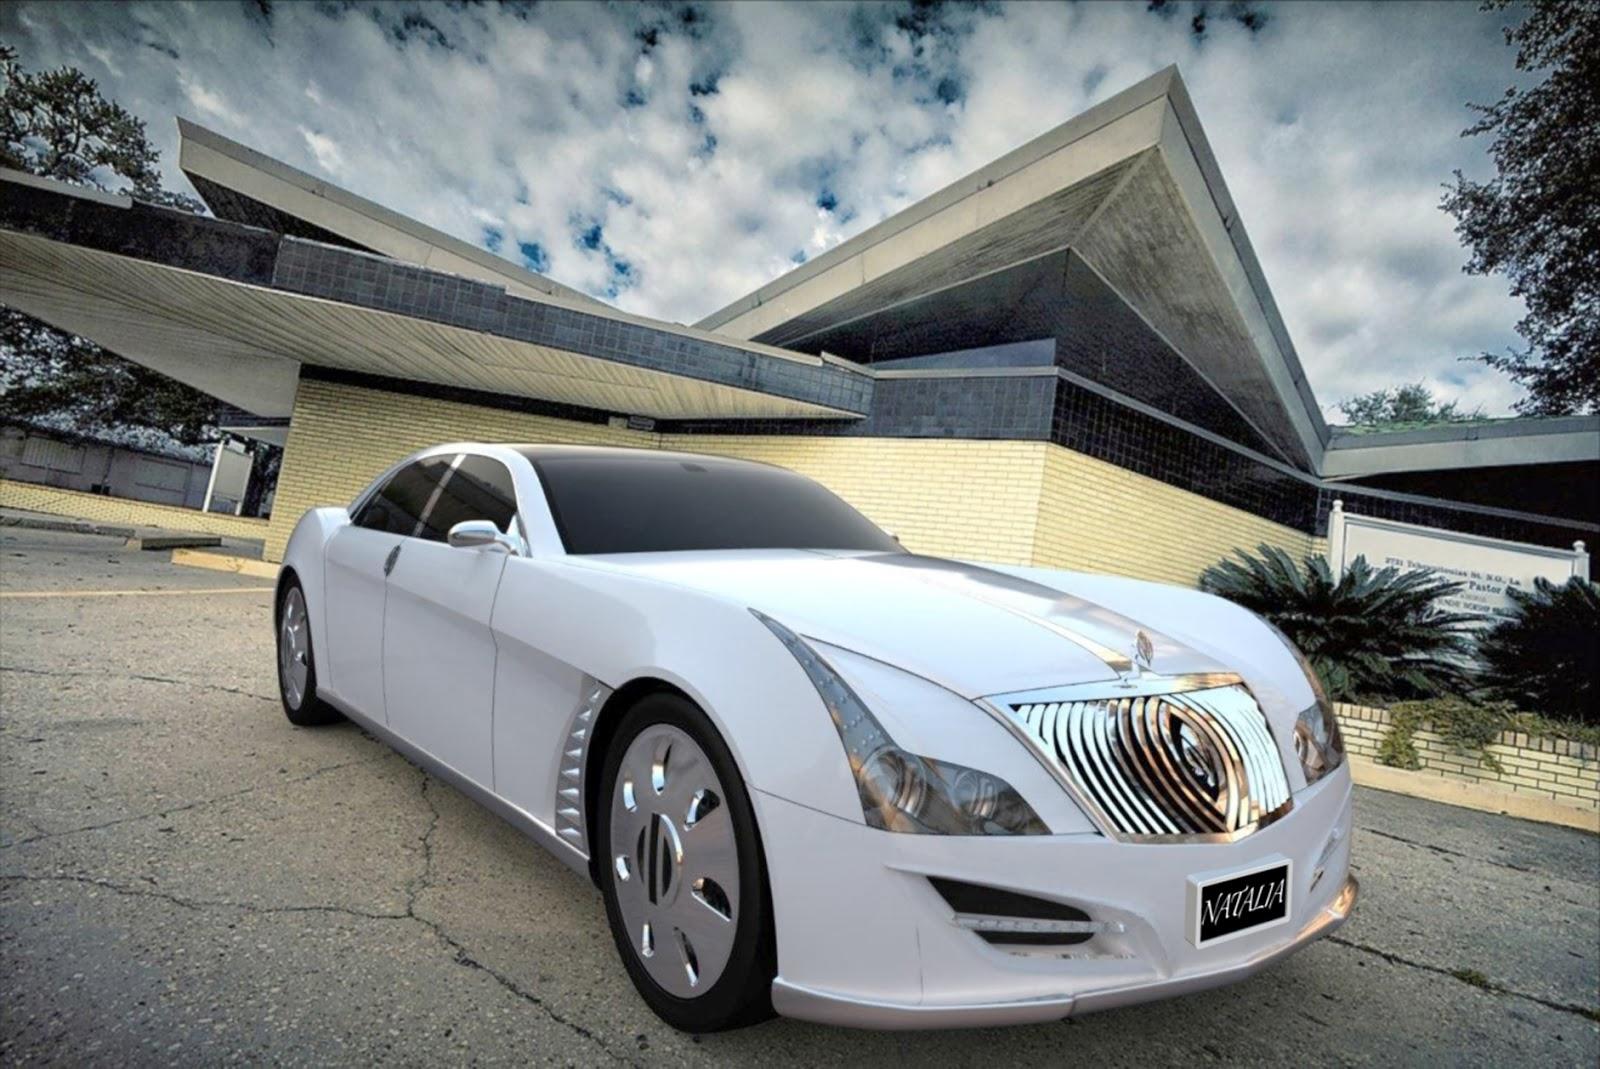 Luxury Cars: Luxury Life Design: $2 Million Luxury Car Concept